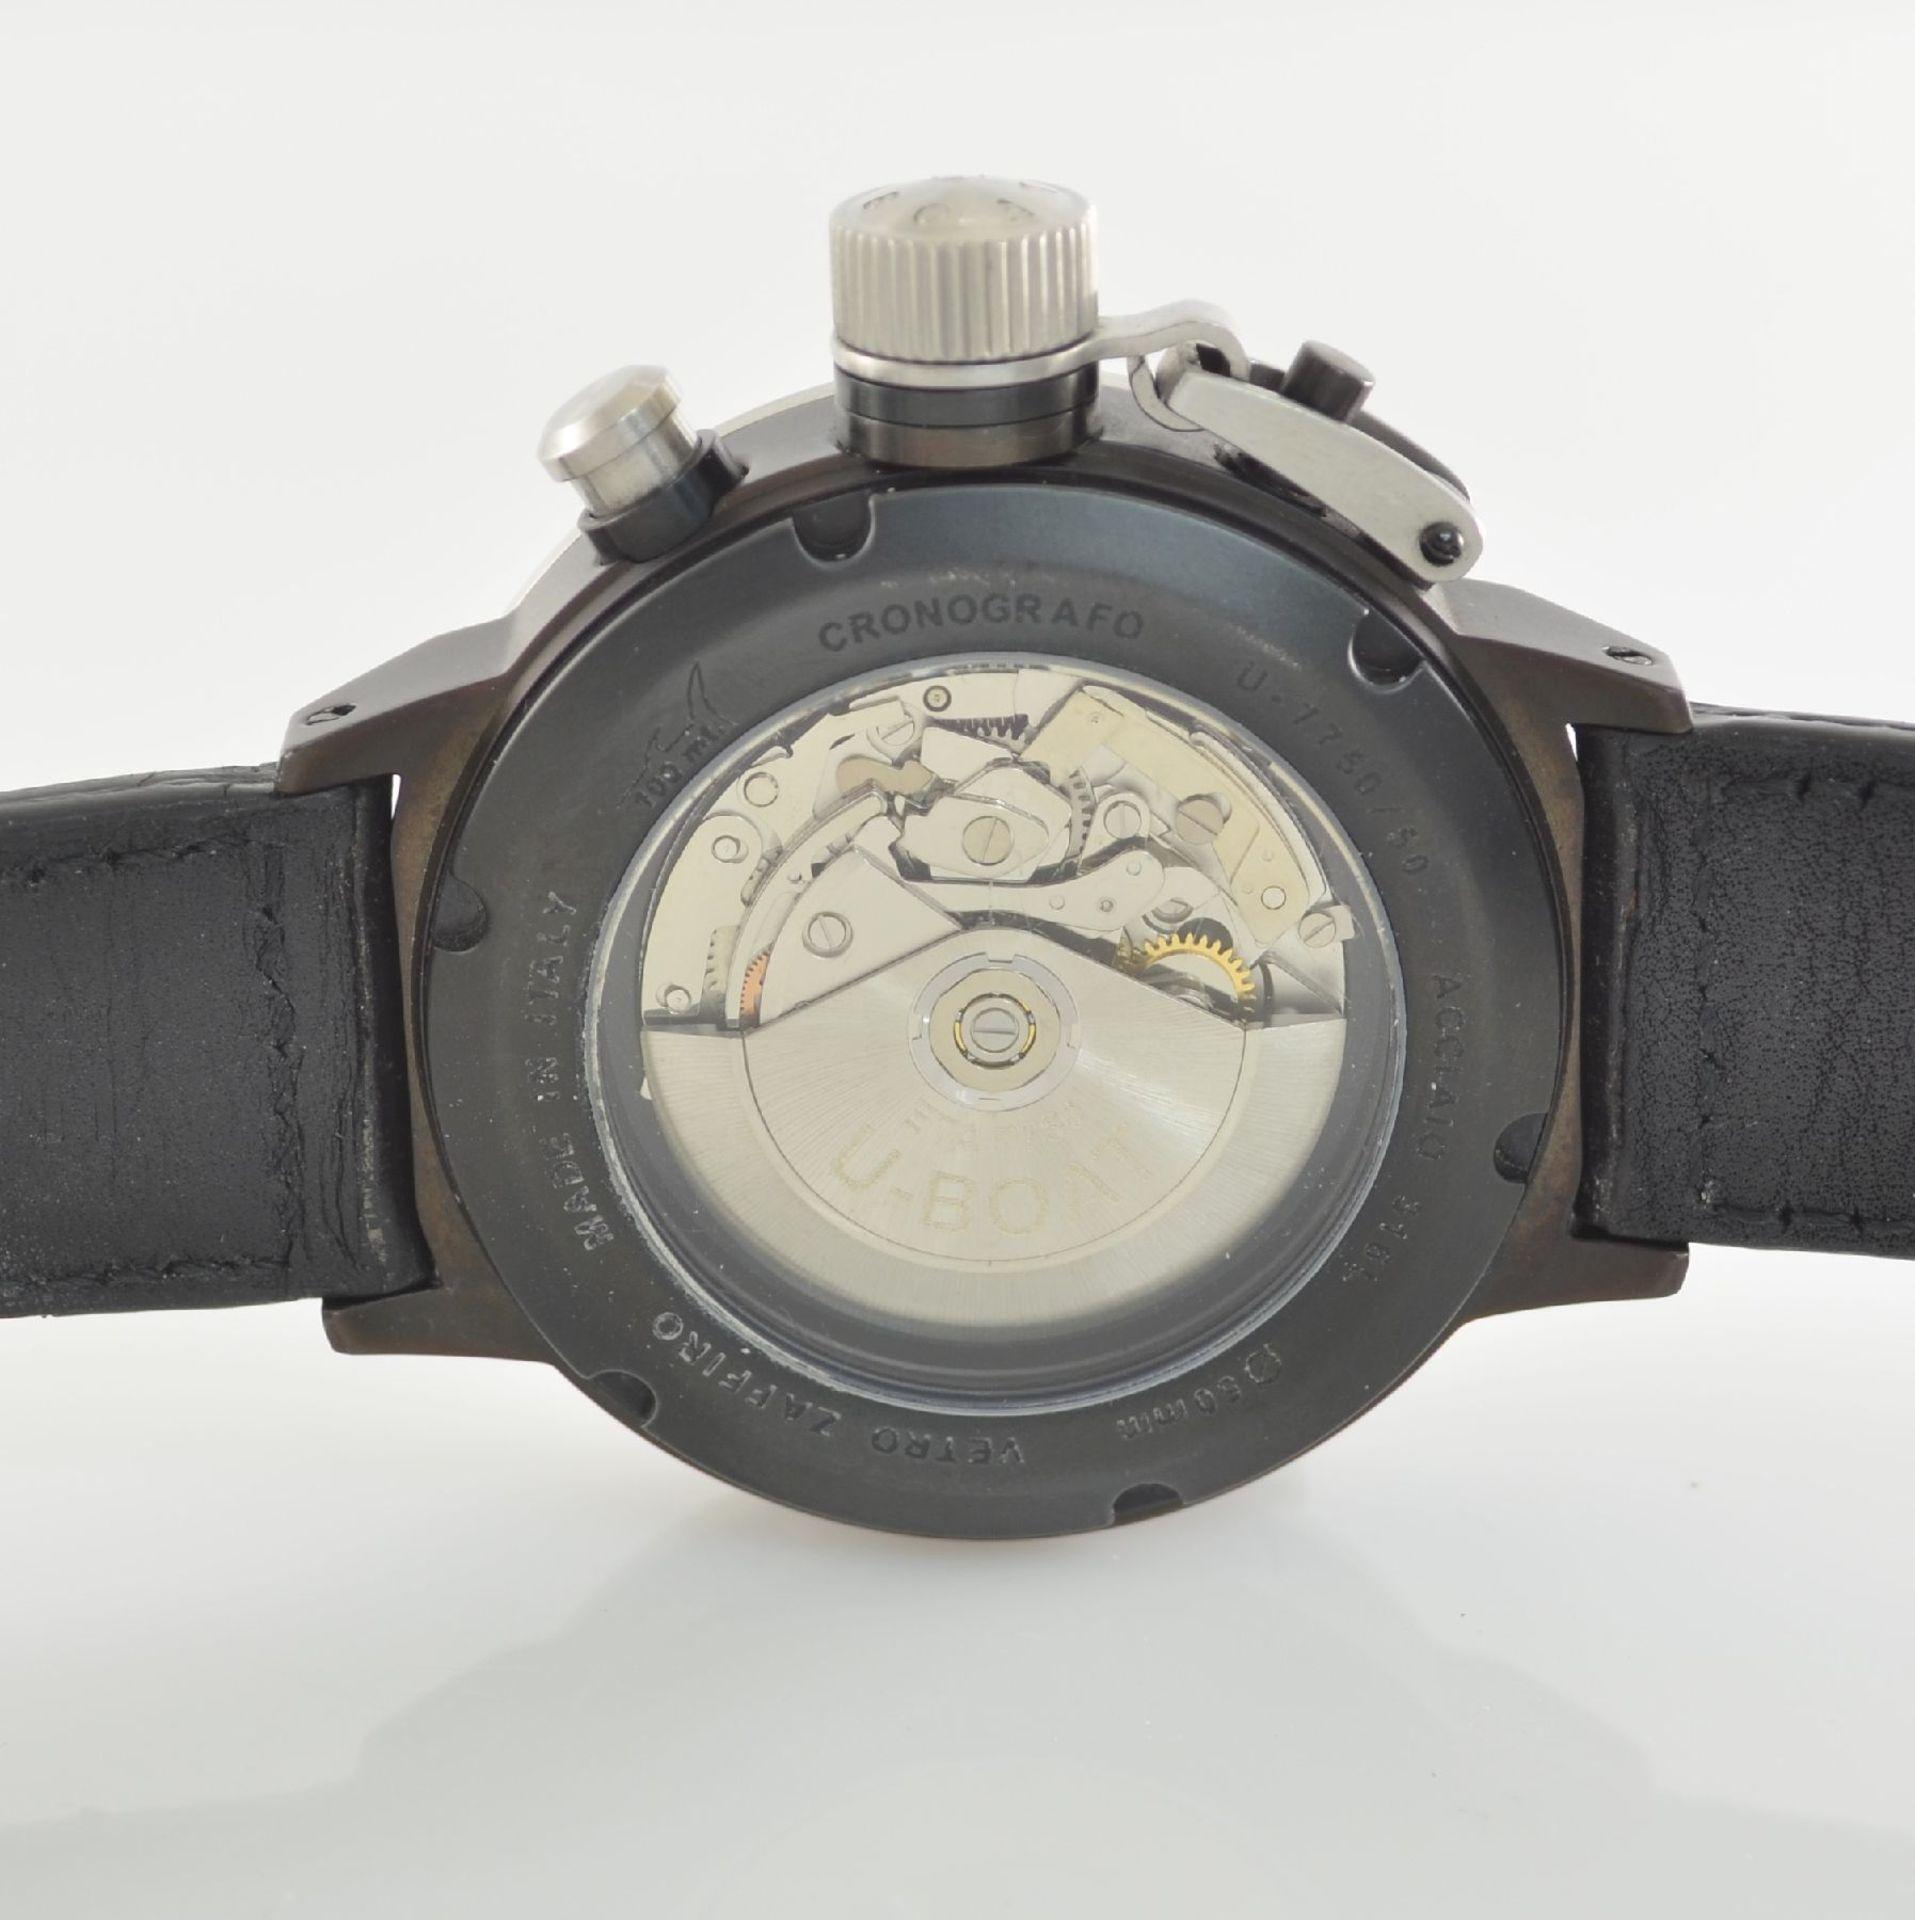 U-BOAT Italo Fontana Herrenarmbanduhr mit Chronograph Model Flightdeck, Automatik, Italien um - Bild 4 aus 5